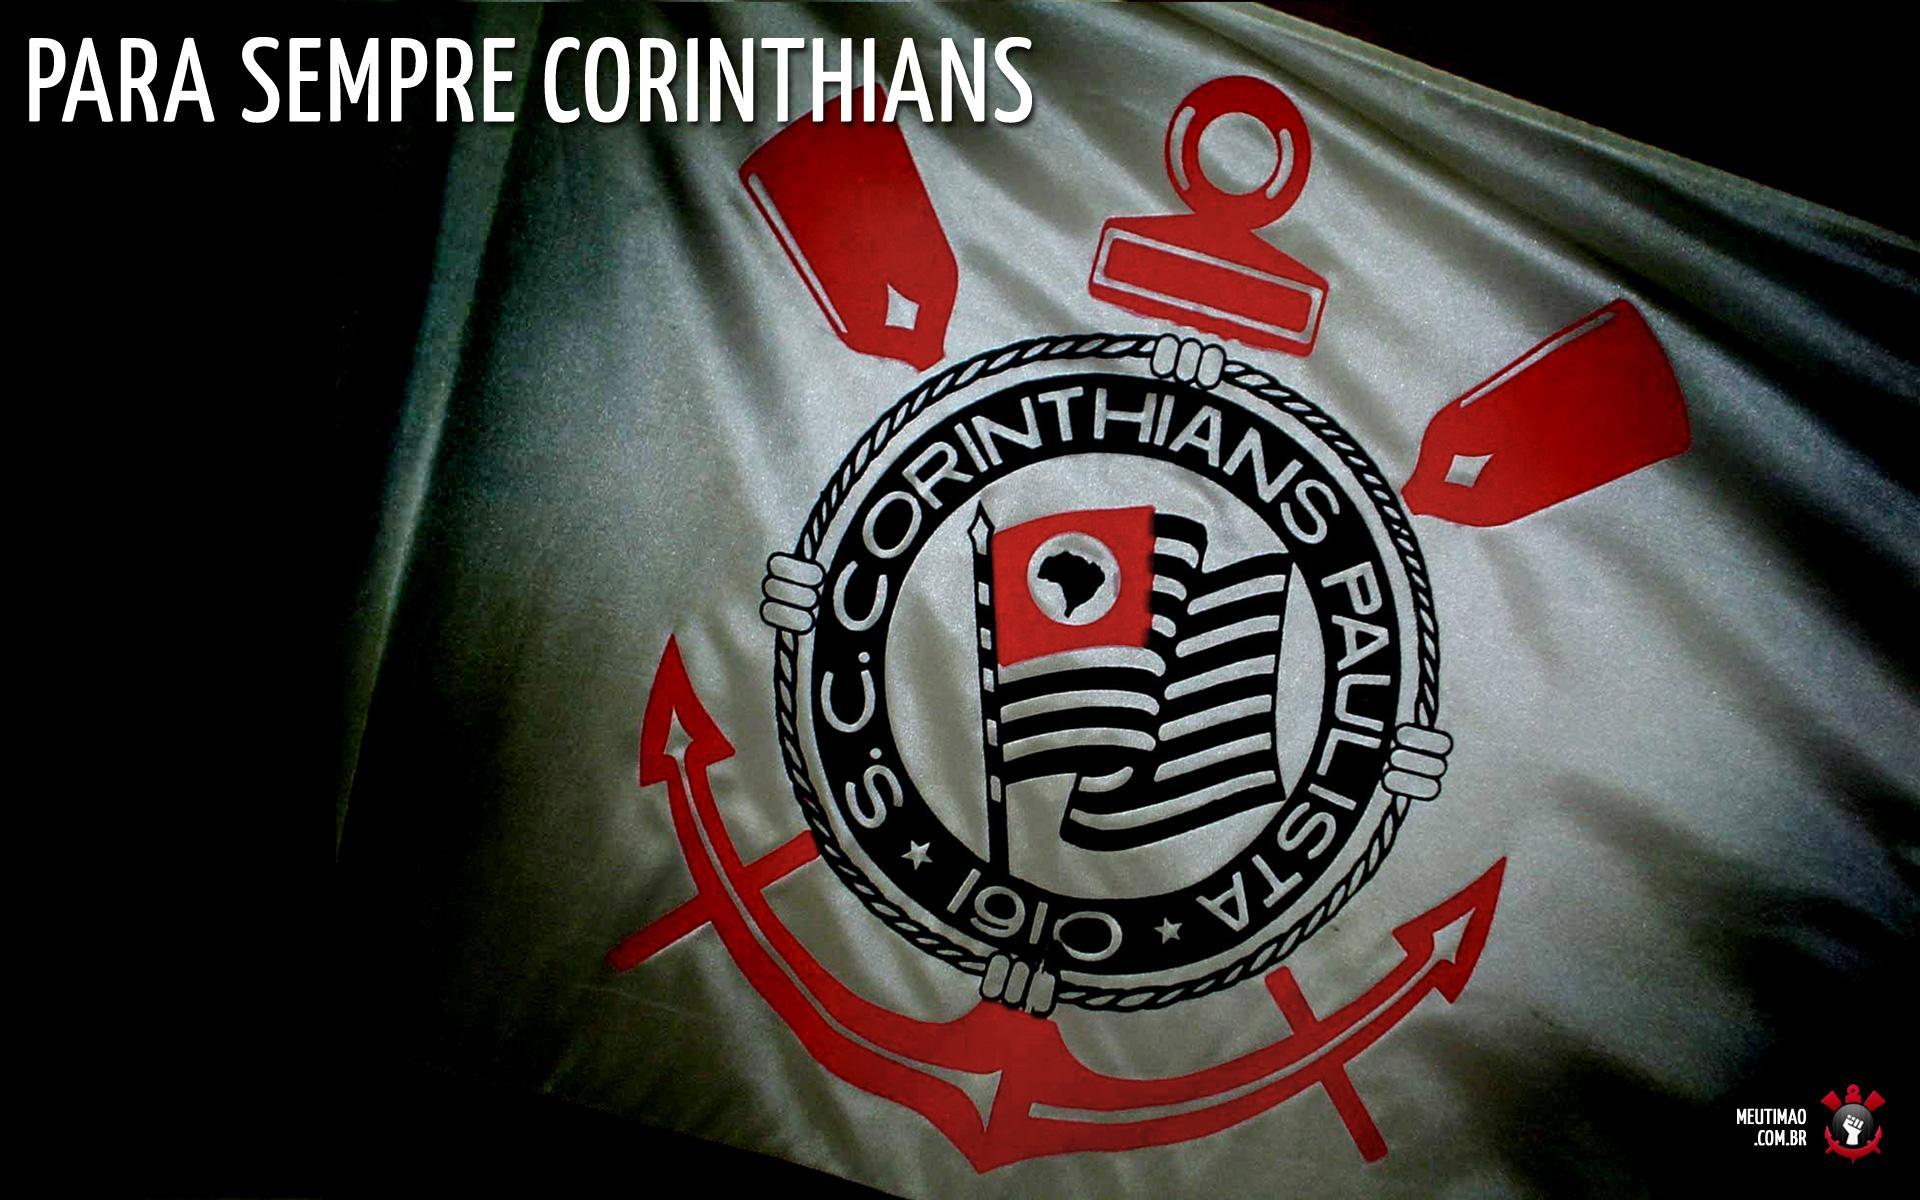 Wallpaper Do Corinthians: Para Sempre Corinthians